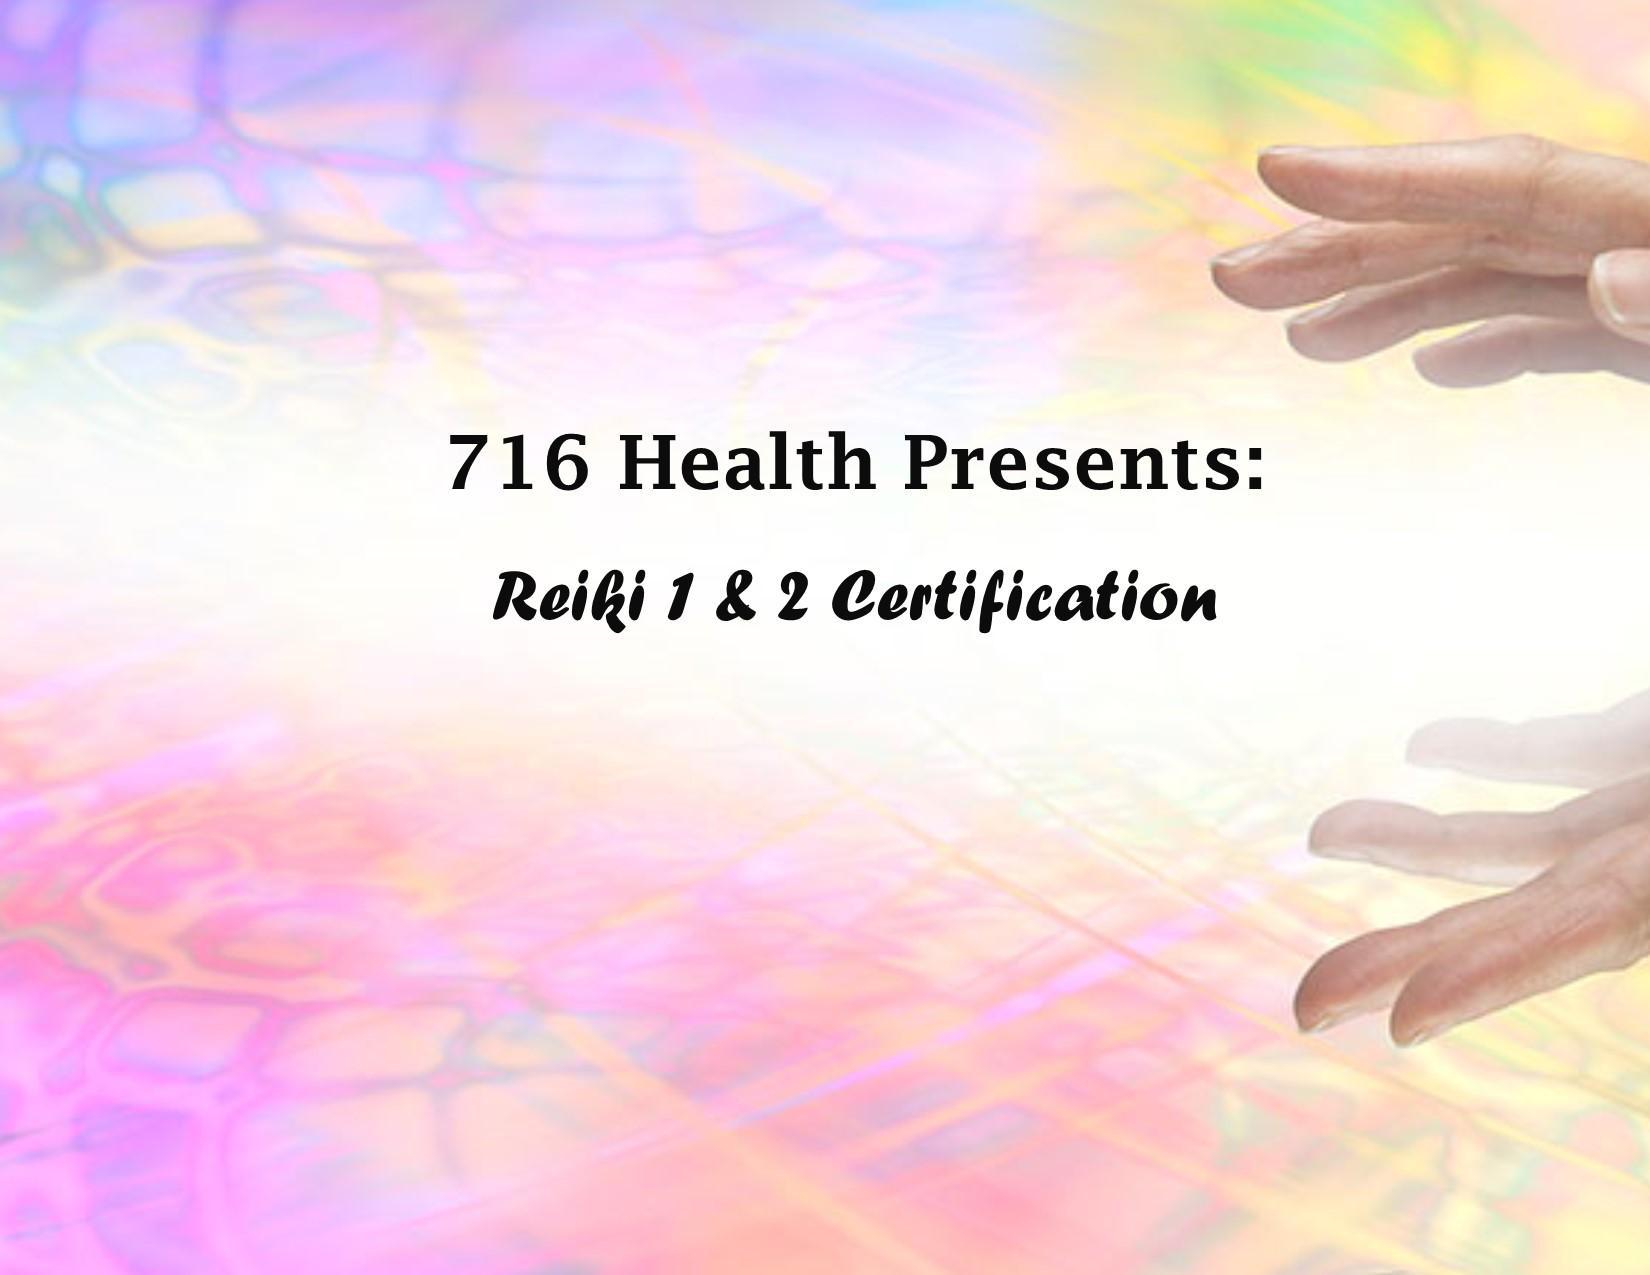 716 Health Presents: Reiki 1 & 2 Certificatio